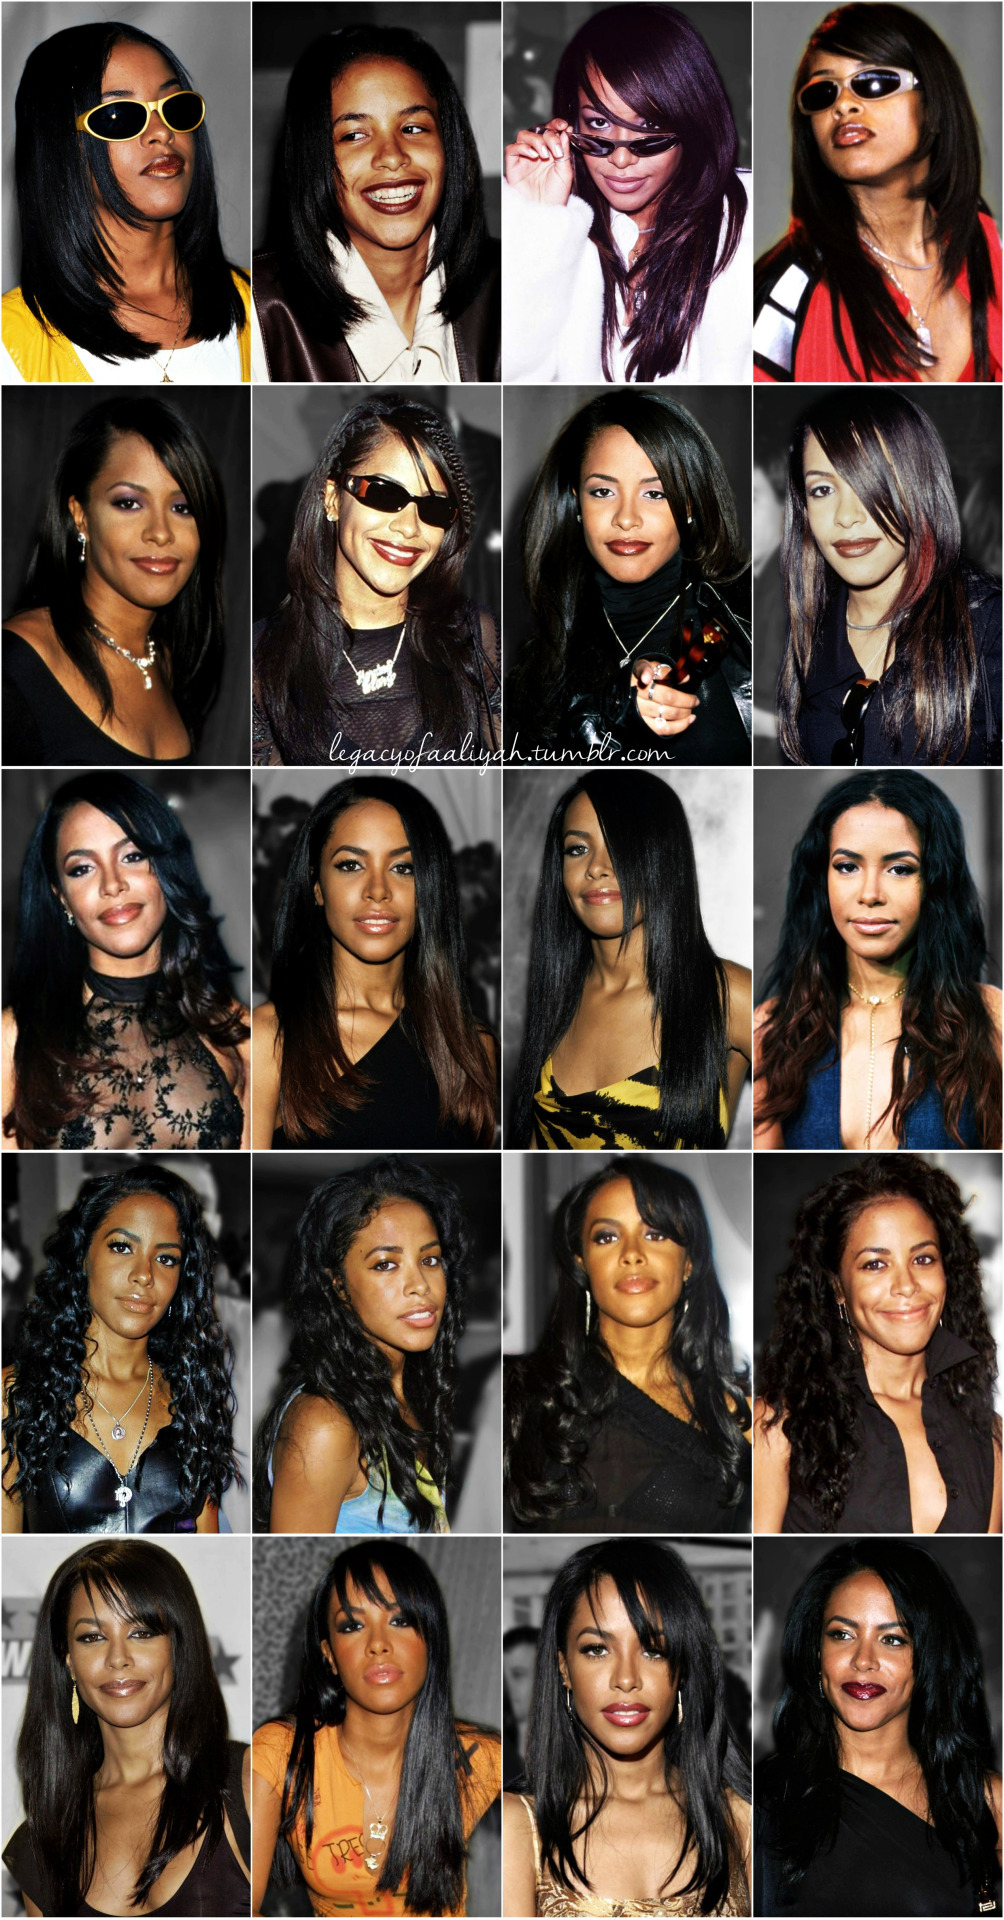 Aaliyah Hairstyle : aaliyah, hairstyle, Legacy, Aaliyah, Aaliyah's, Hairstyle, Always, Perfect.